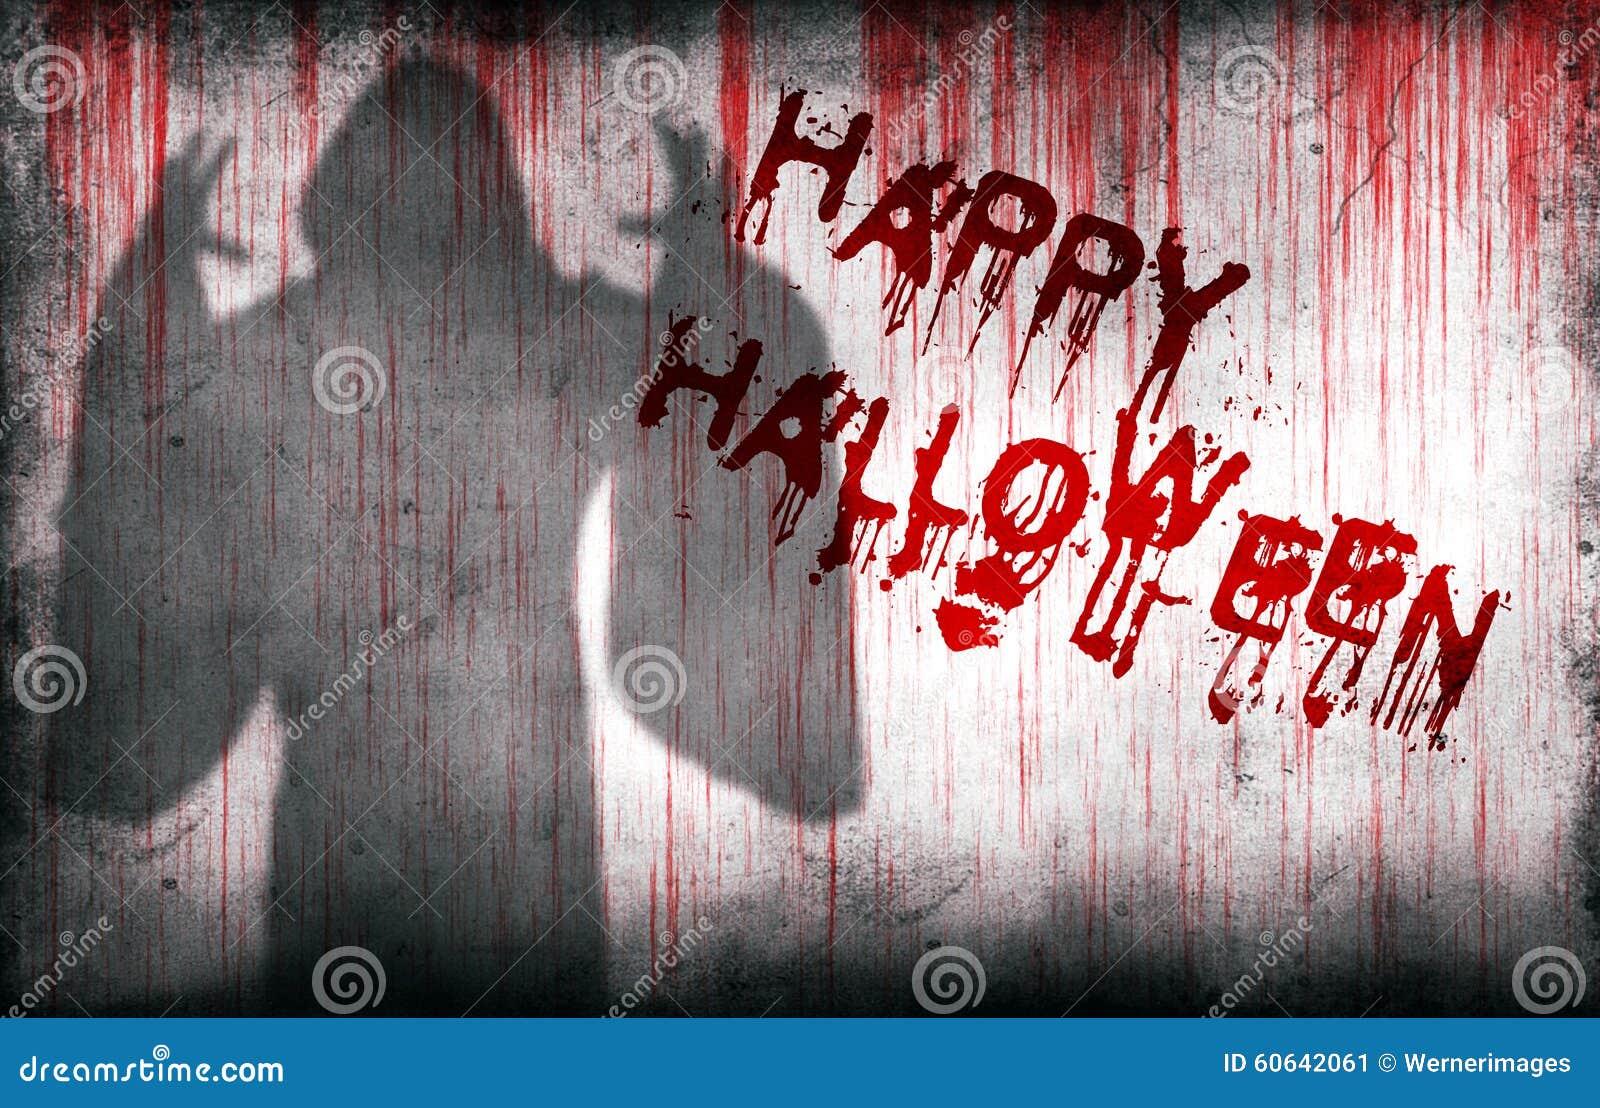 Happy Halloween sprayed on wall next ghostly shadow